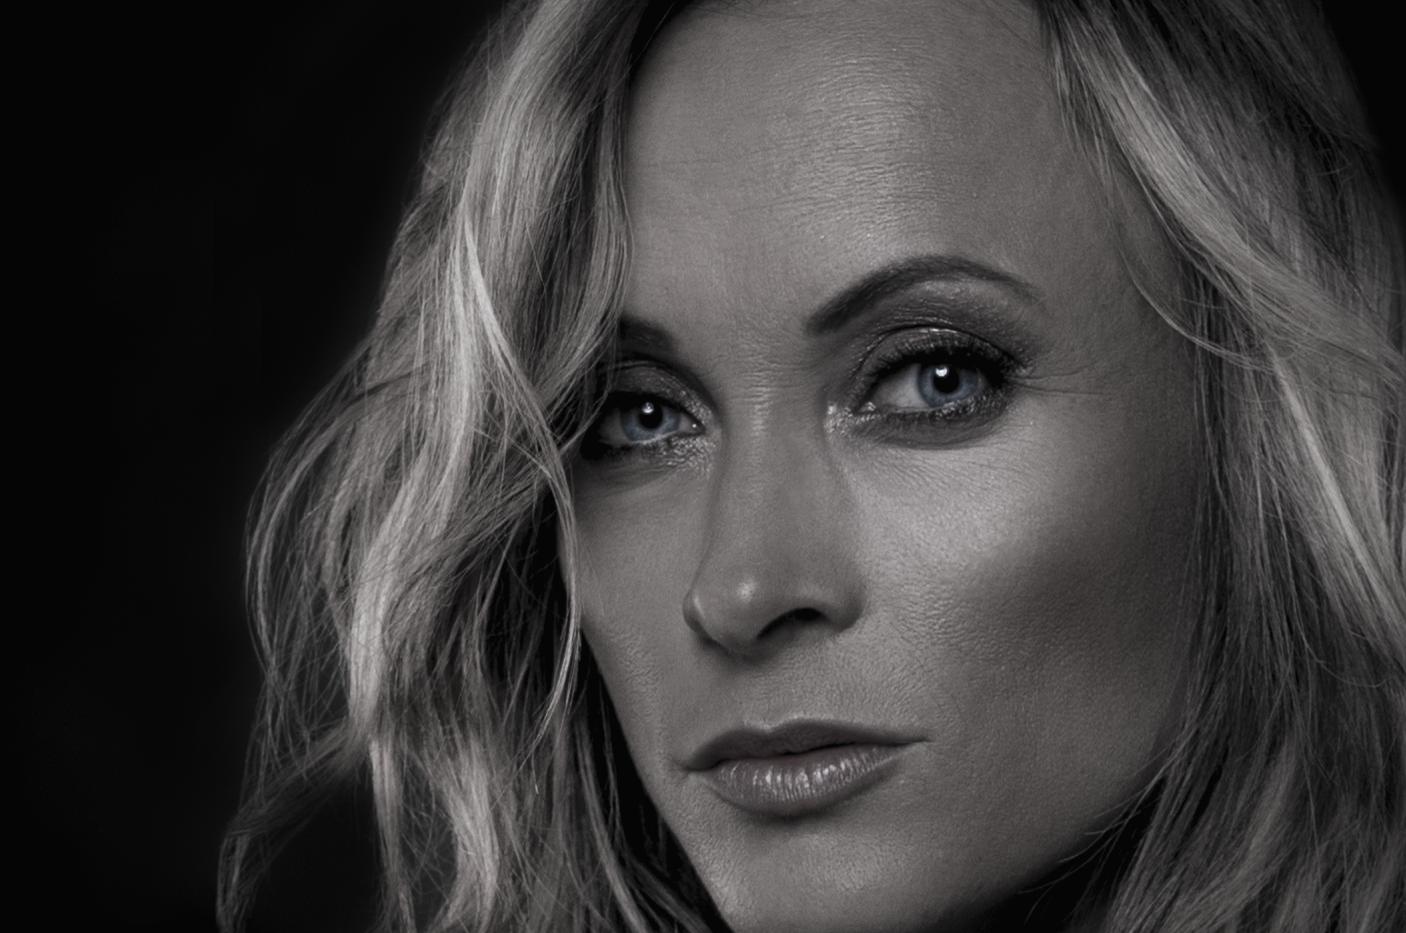 Model: Manuela Groe